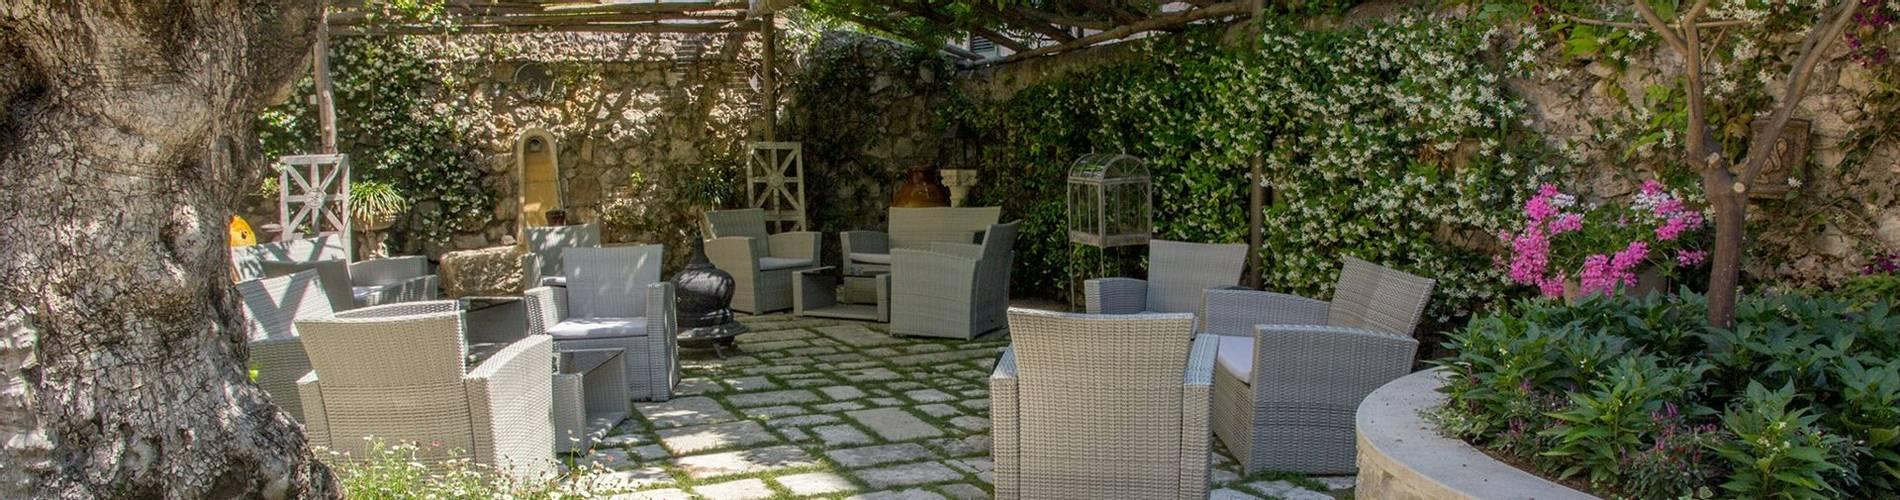 Villa Maria, Amalfi Coast, Italy, Garden.jpg